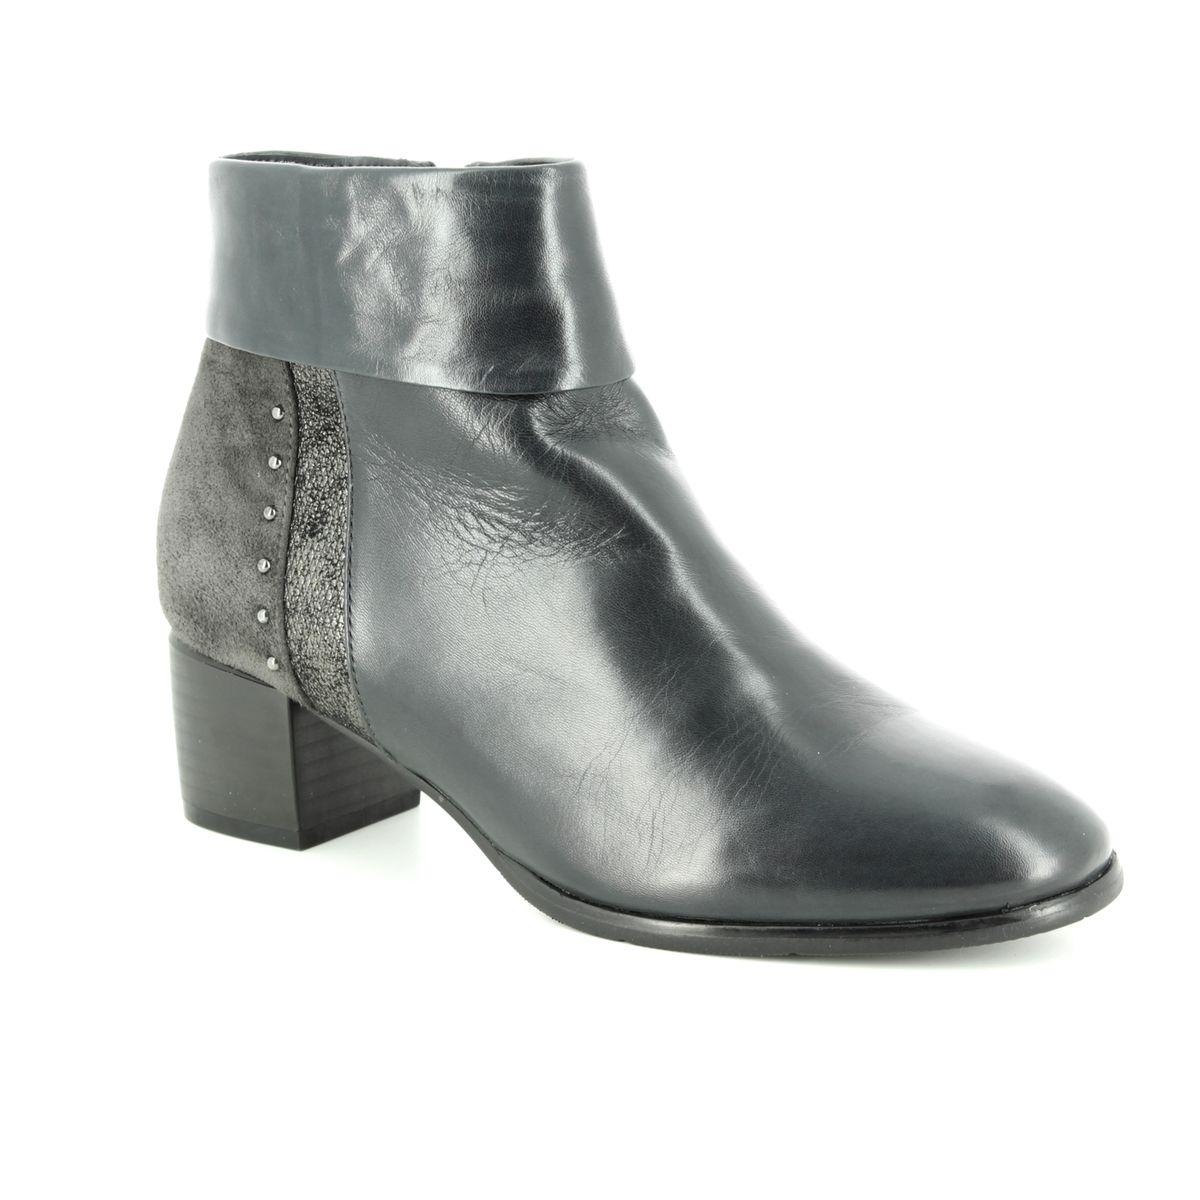 885ed072 Regarde le Ciel Ankle Boots - Grey matt leather - 3898/00 CORINNE 02